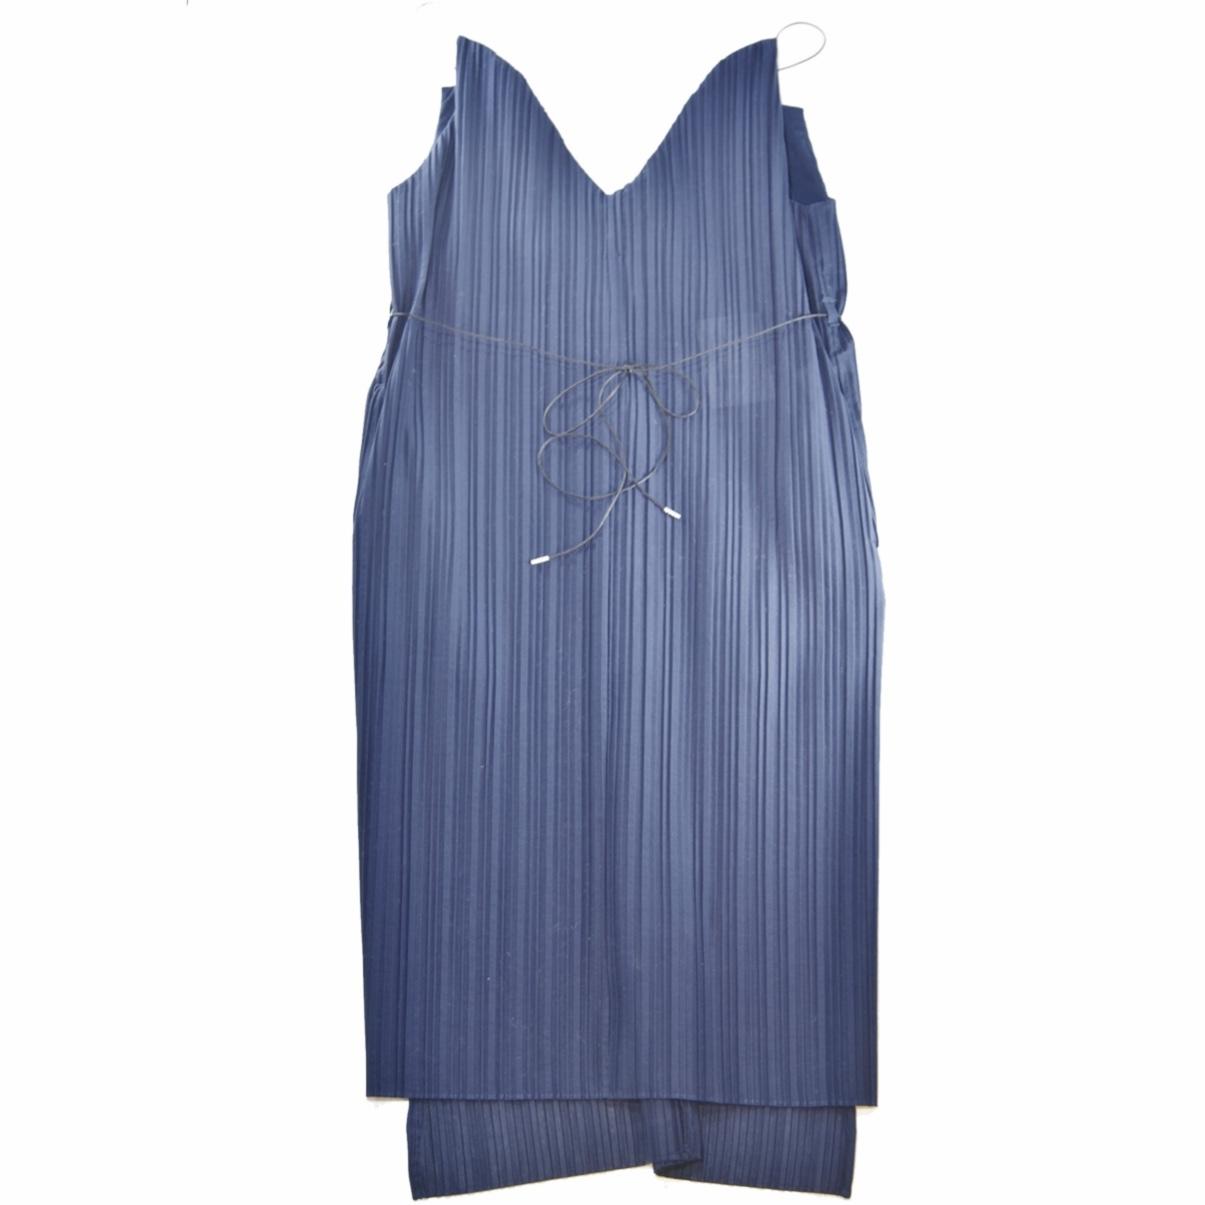 BELPER PLEATED CAMISOLE DRESS